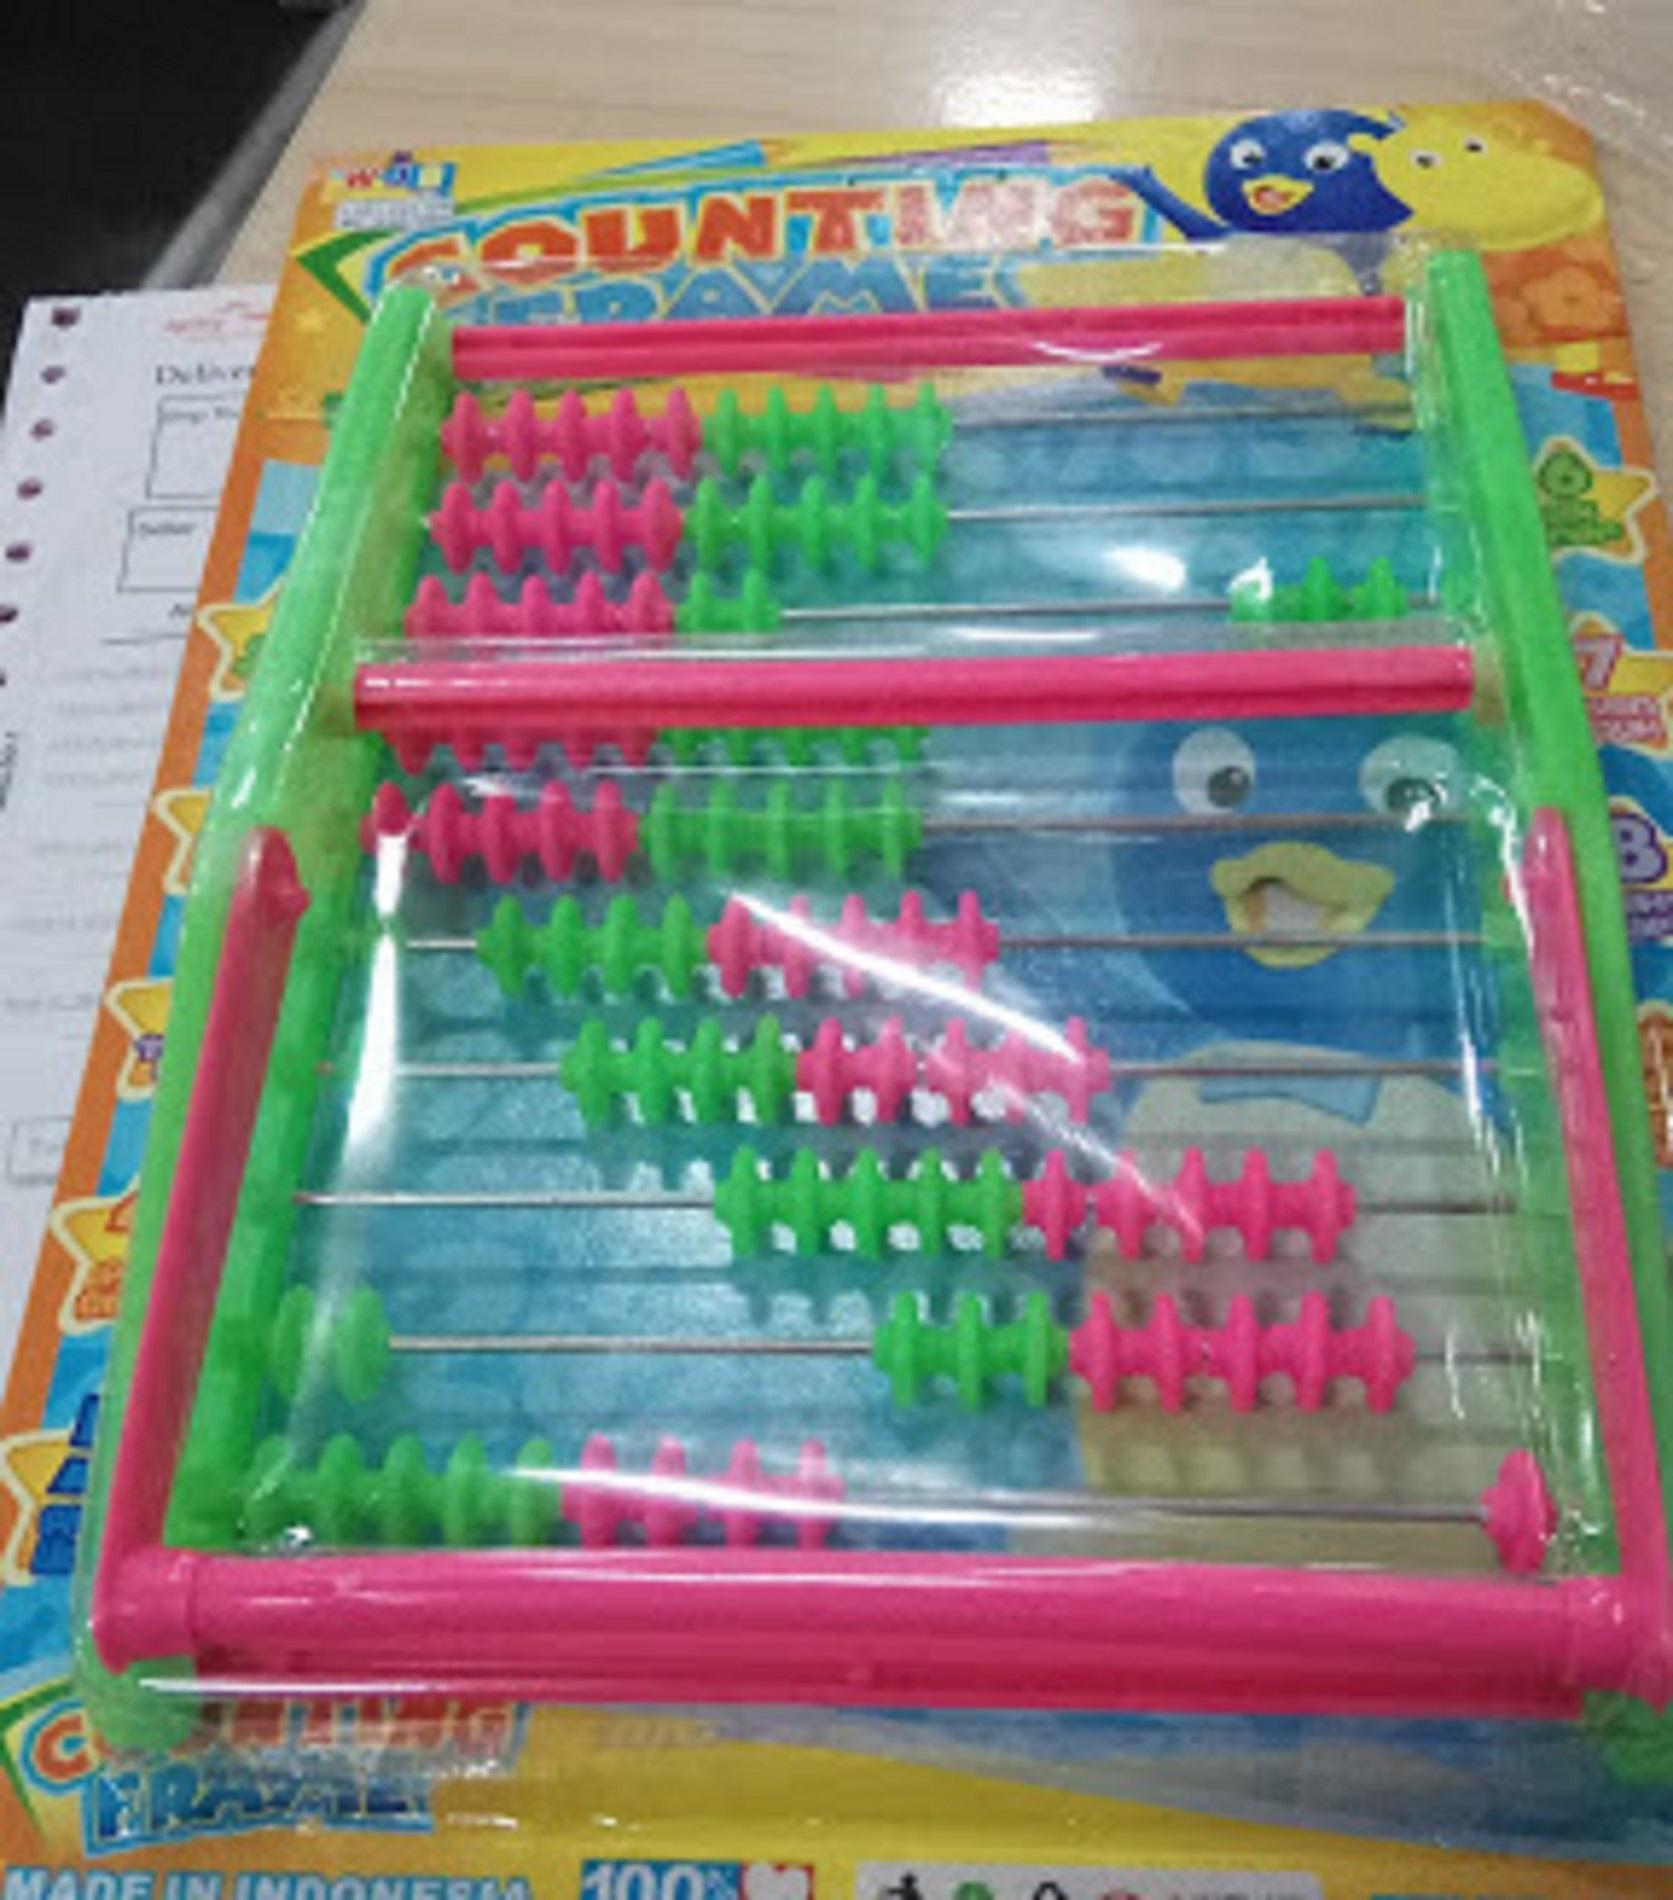 Griyaazzadot Mainan Anak Sempoa Pintar Matematika SD TK Belajar Berhitung Multi Warna